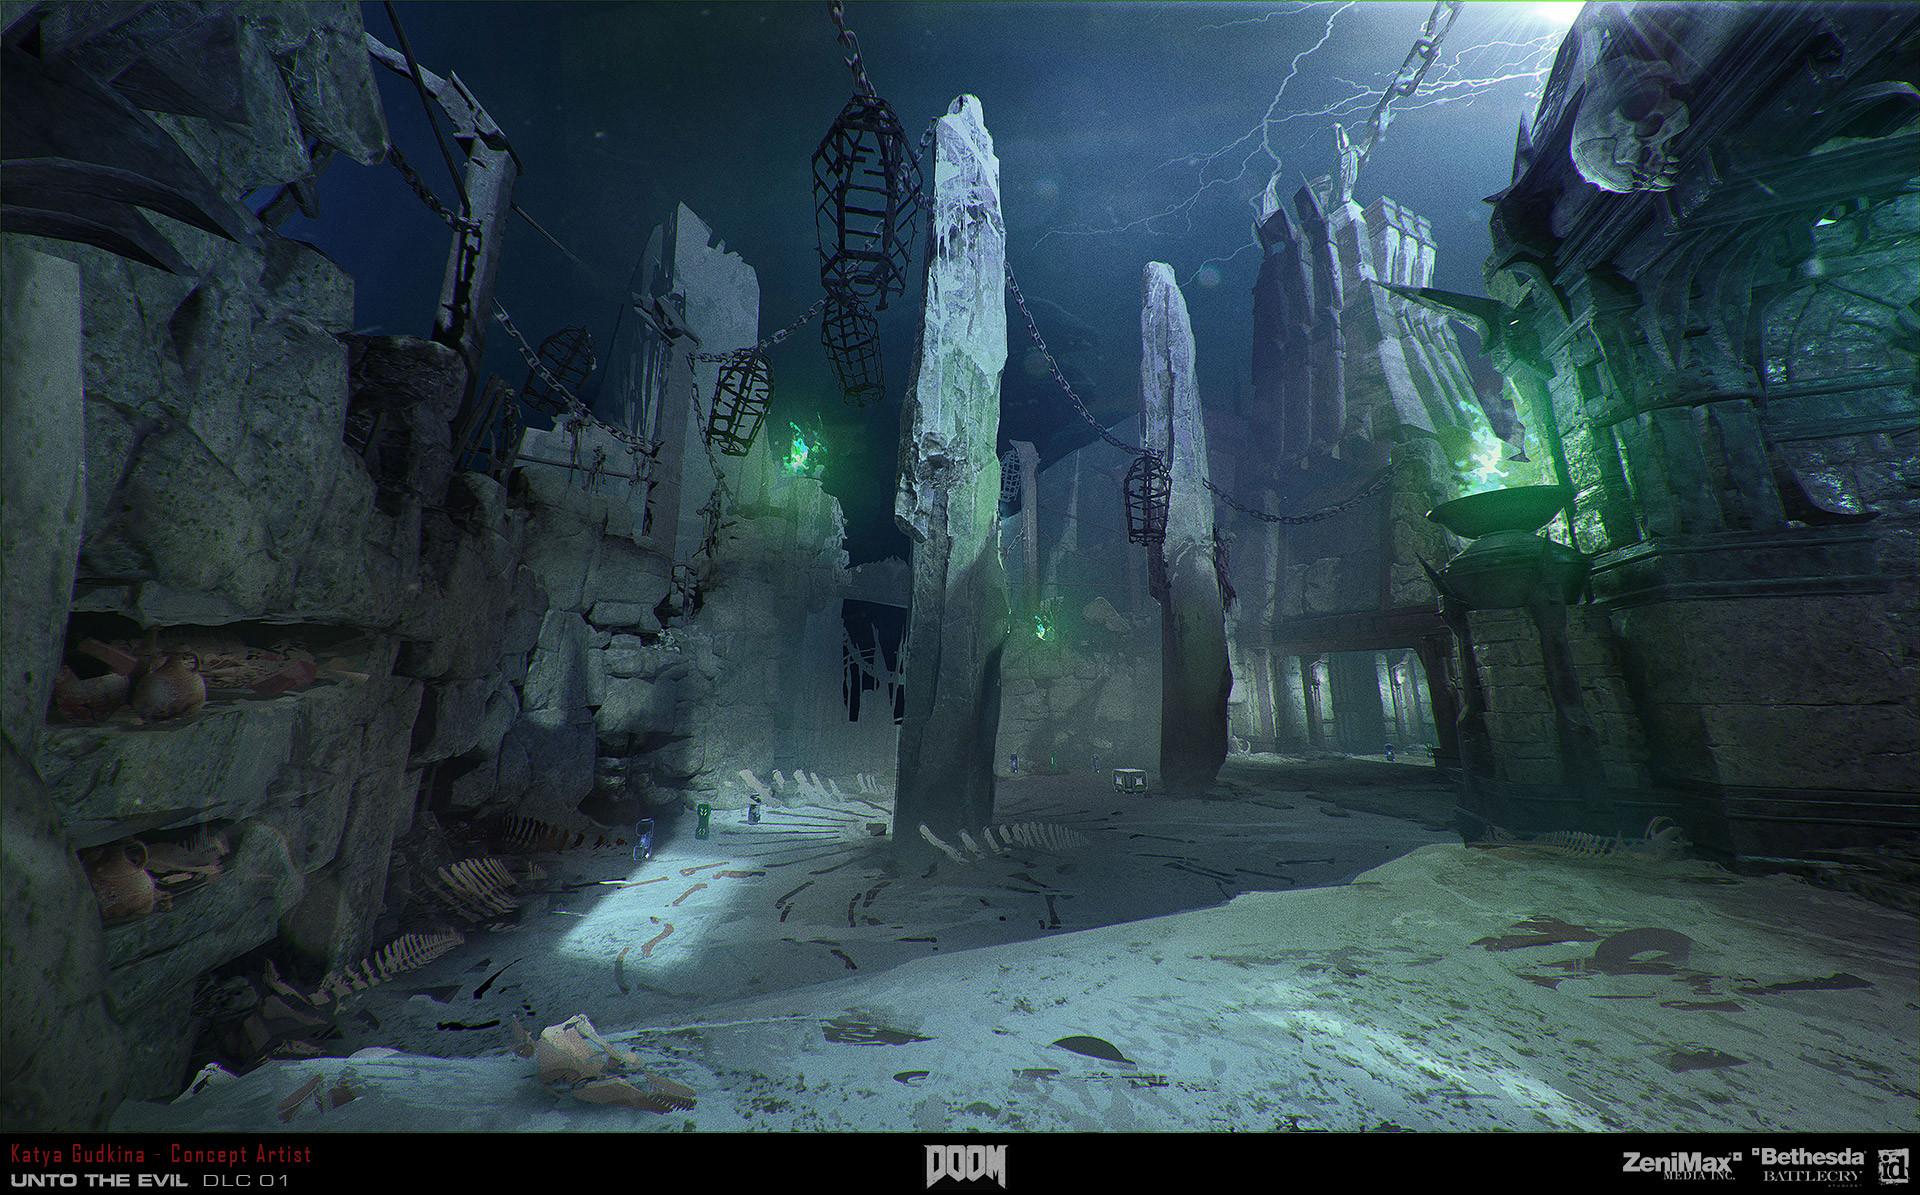 Doom Remake 4